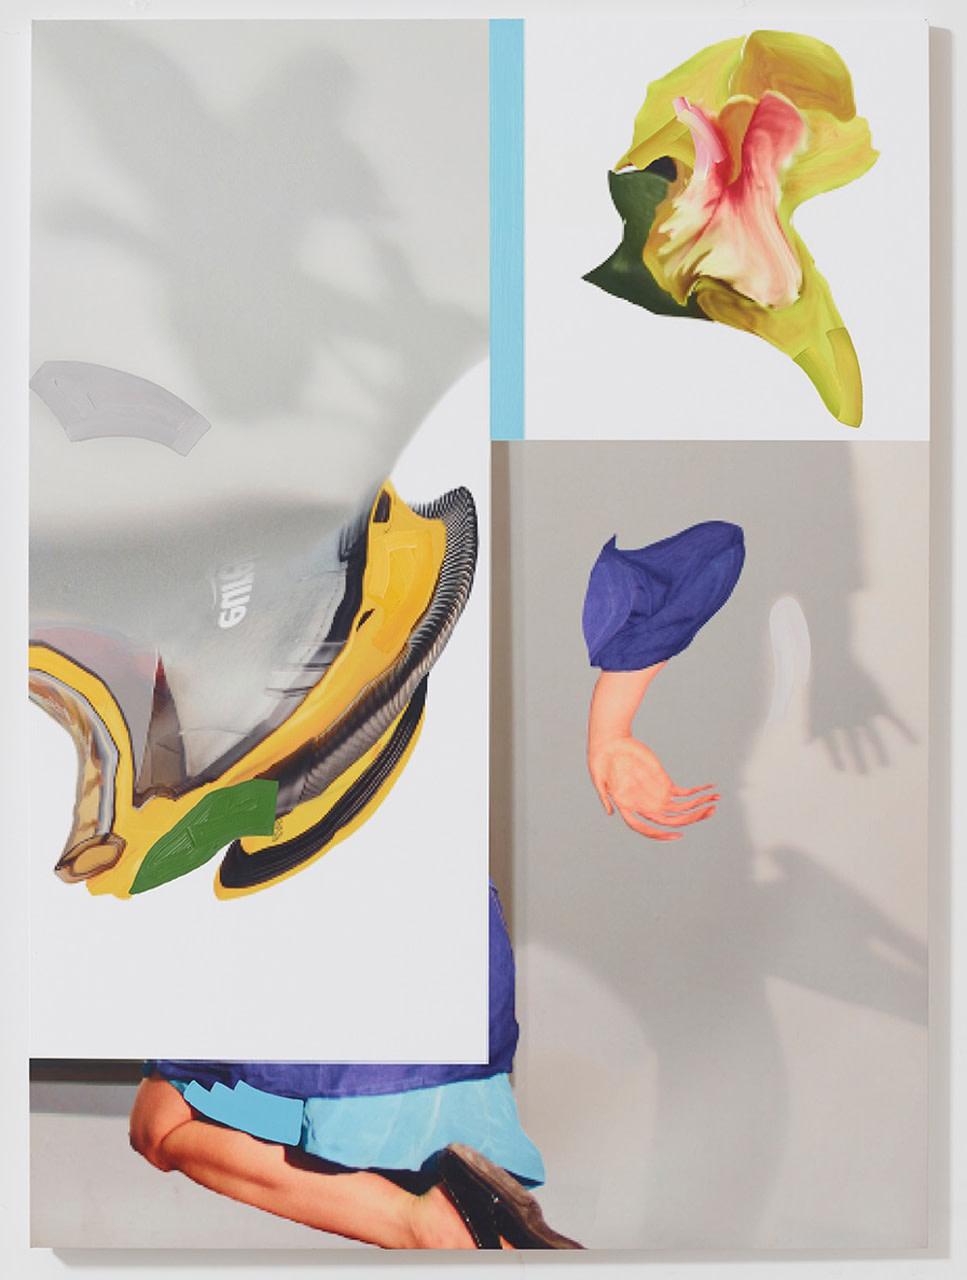 "<div class=""artwork_caption""><p>Pieter Schoolwerth, Make Up #5, 2014</p></div>"